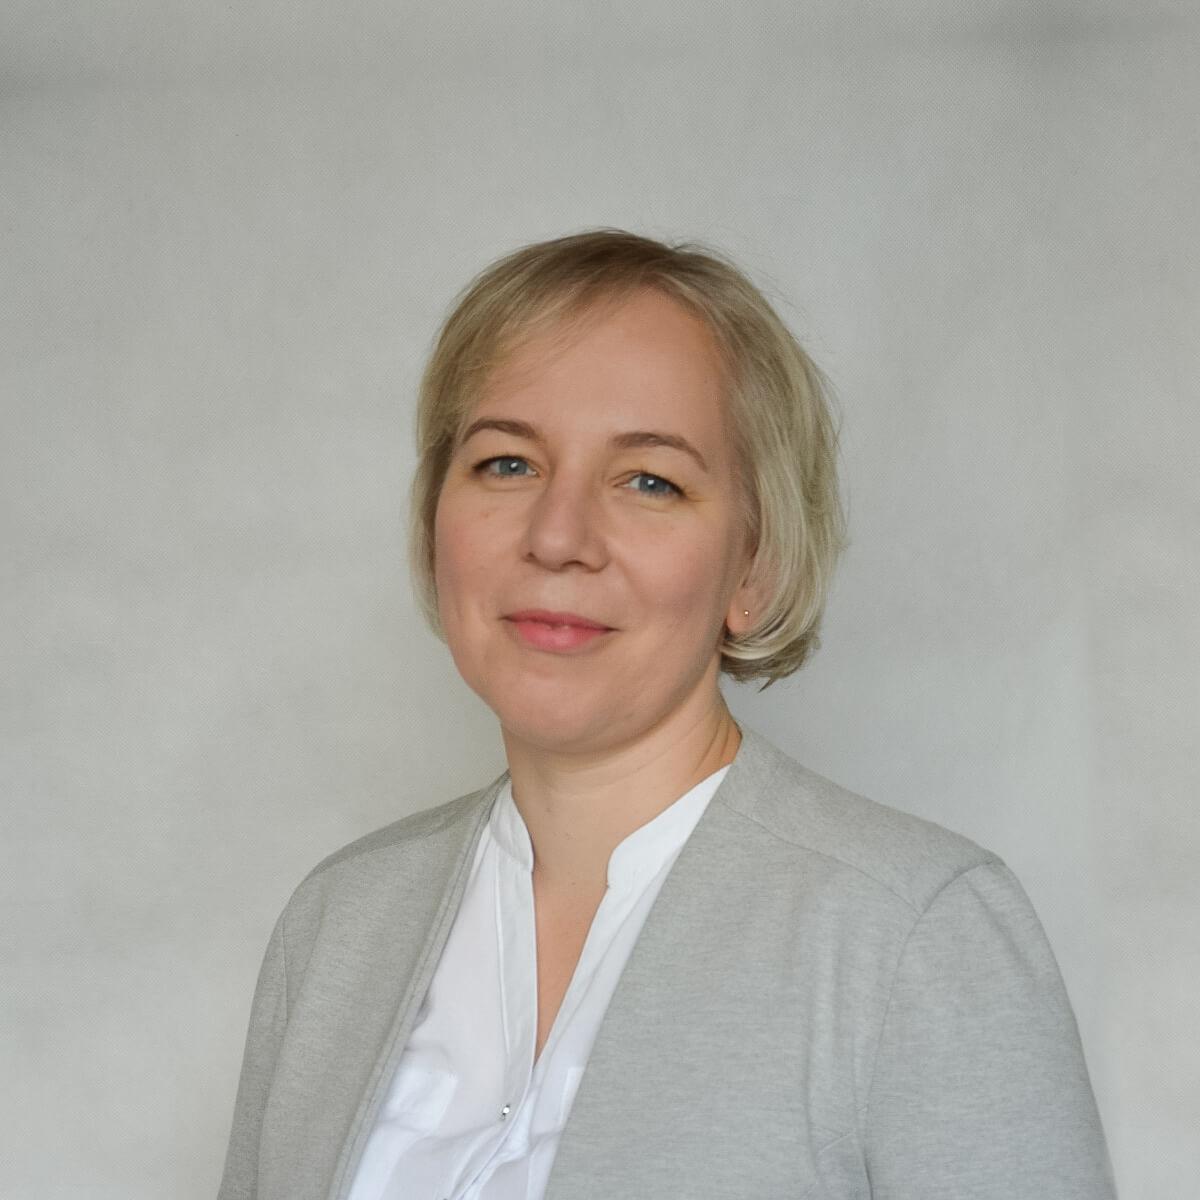 Ewa Kaleta - Centrum Słowo